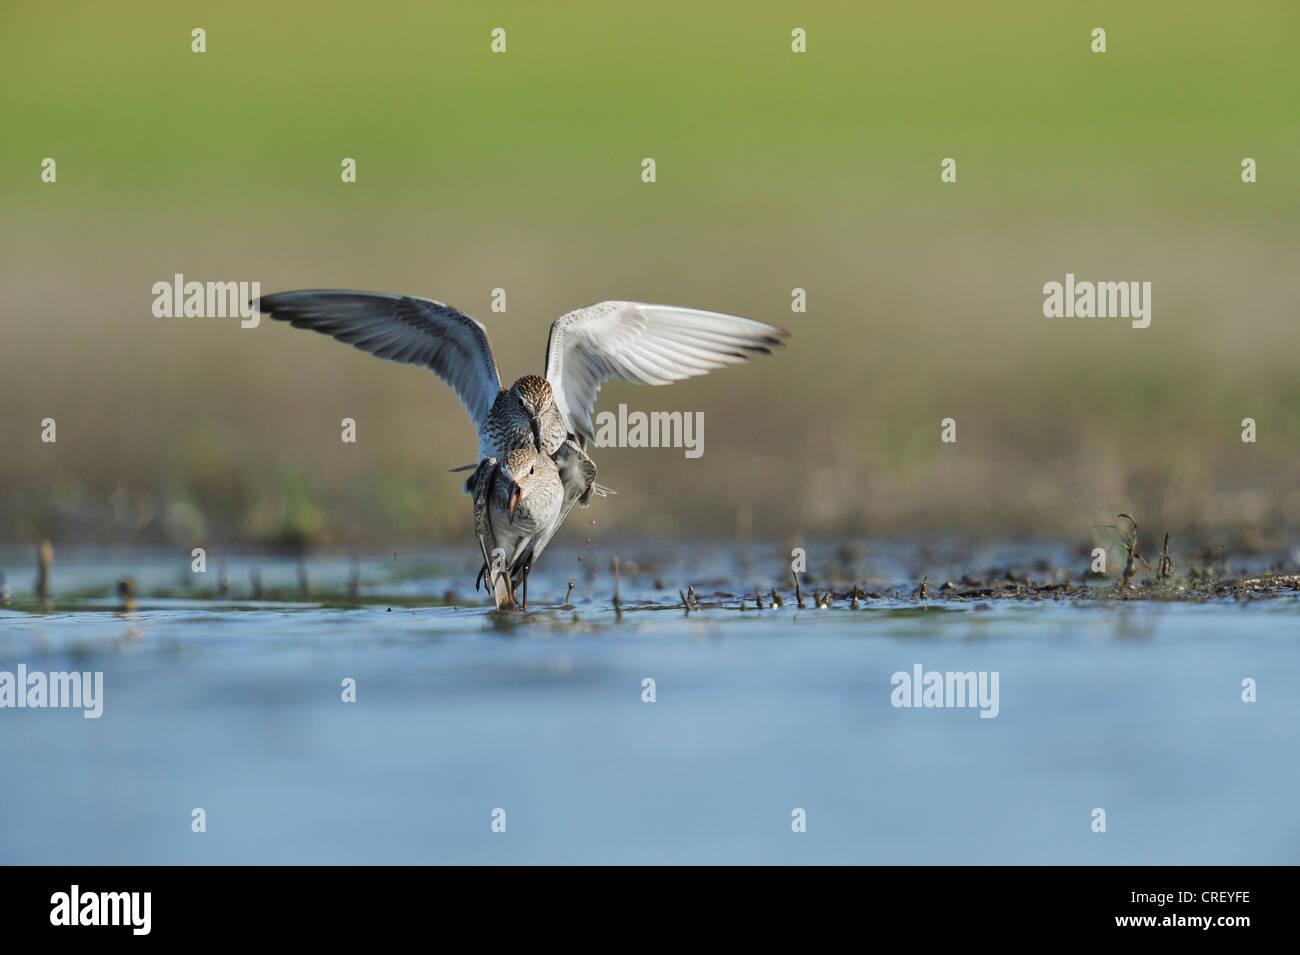 White-rumped Sandpiper (Calidris fuscicollis), adults fighting, Dinero, Lake Corpus Christi, South Texas, USA - Stock Image